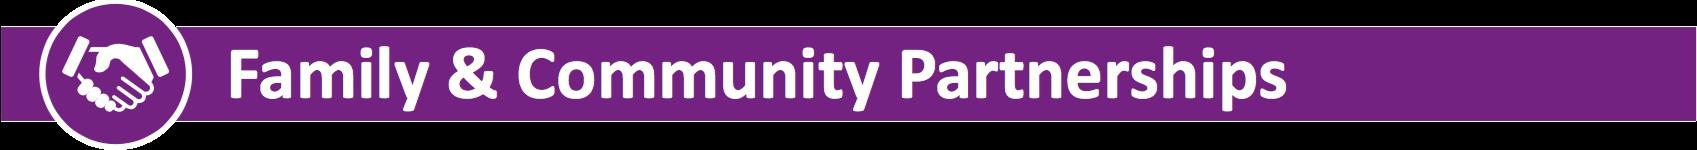 Family and Community Partnerships